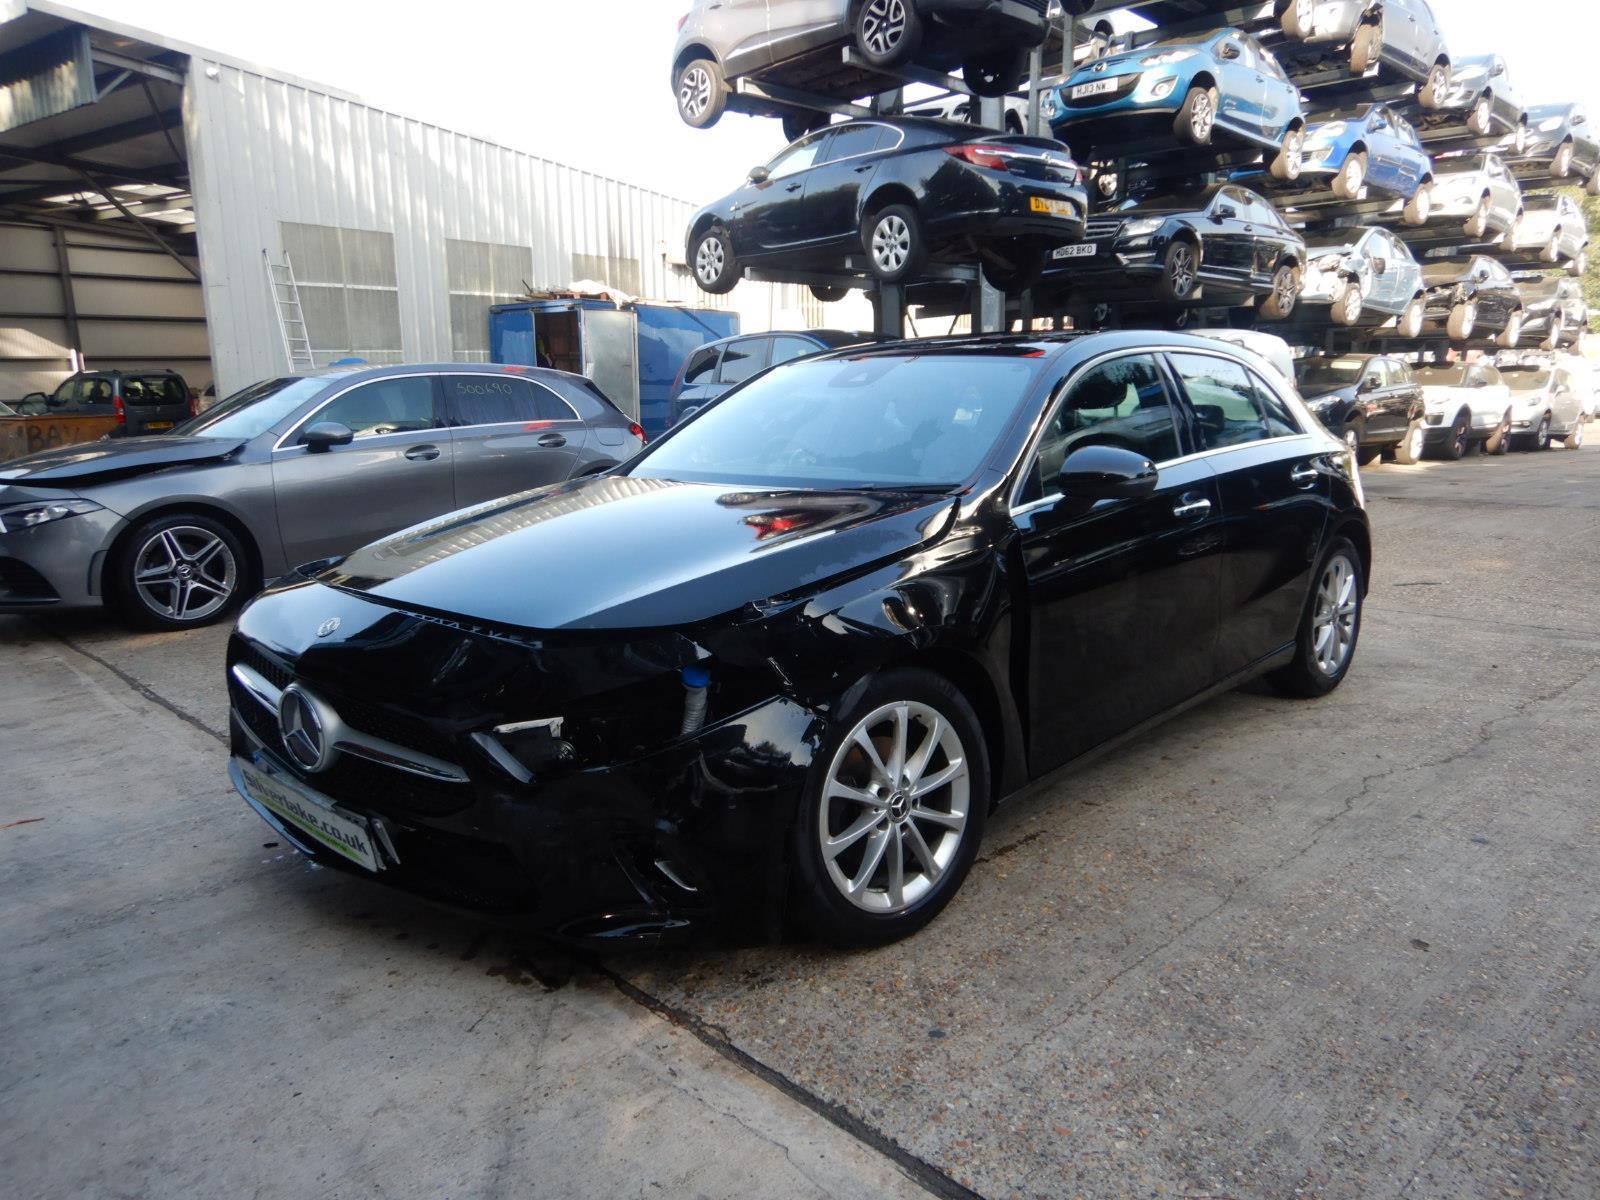 2019 Mercedes-Benz A Class A180 D SPORT PREMIUM 1461cc Turbo Diesel Automatic 7 Speed 5 Door Hatchback